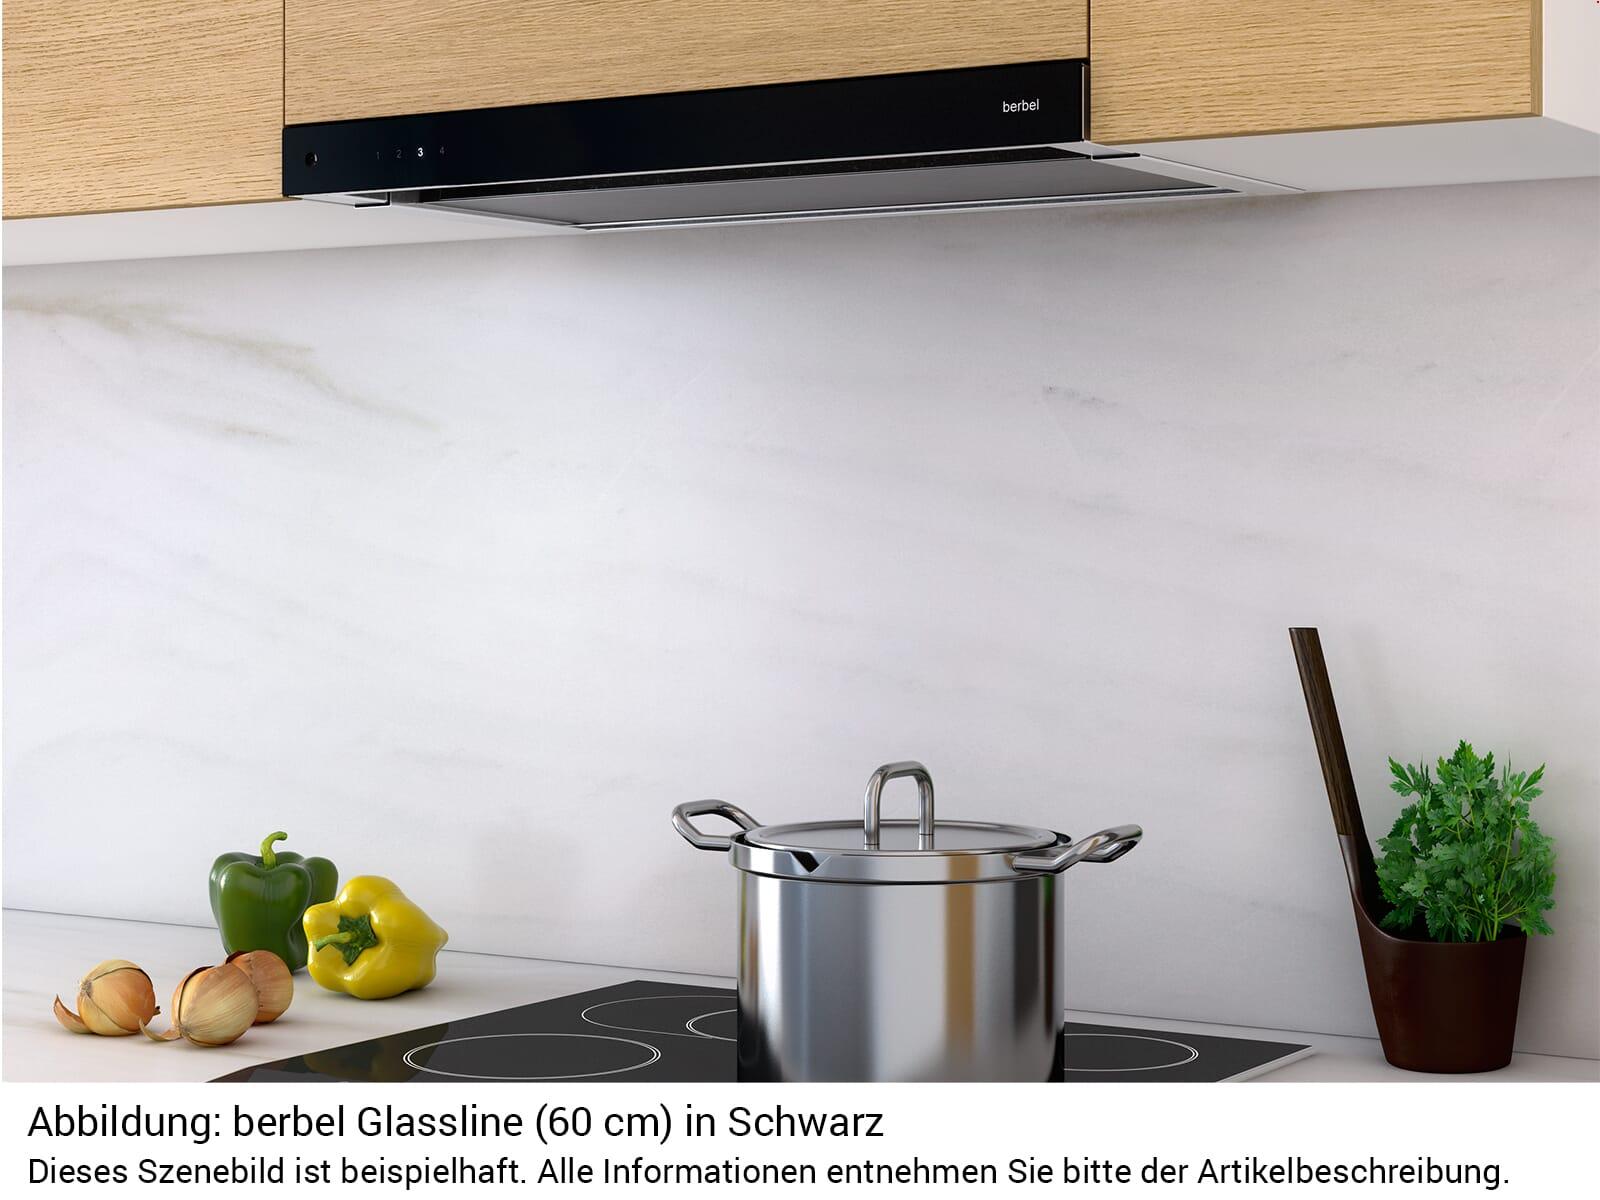 Berbel Glassline BEH 90 GL Flachschirmhaube Schwarz